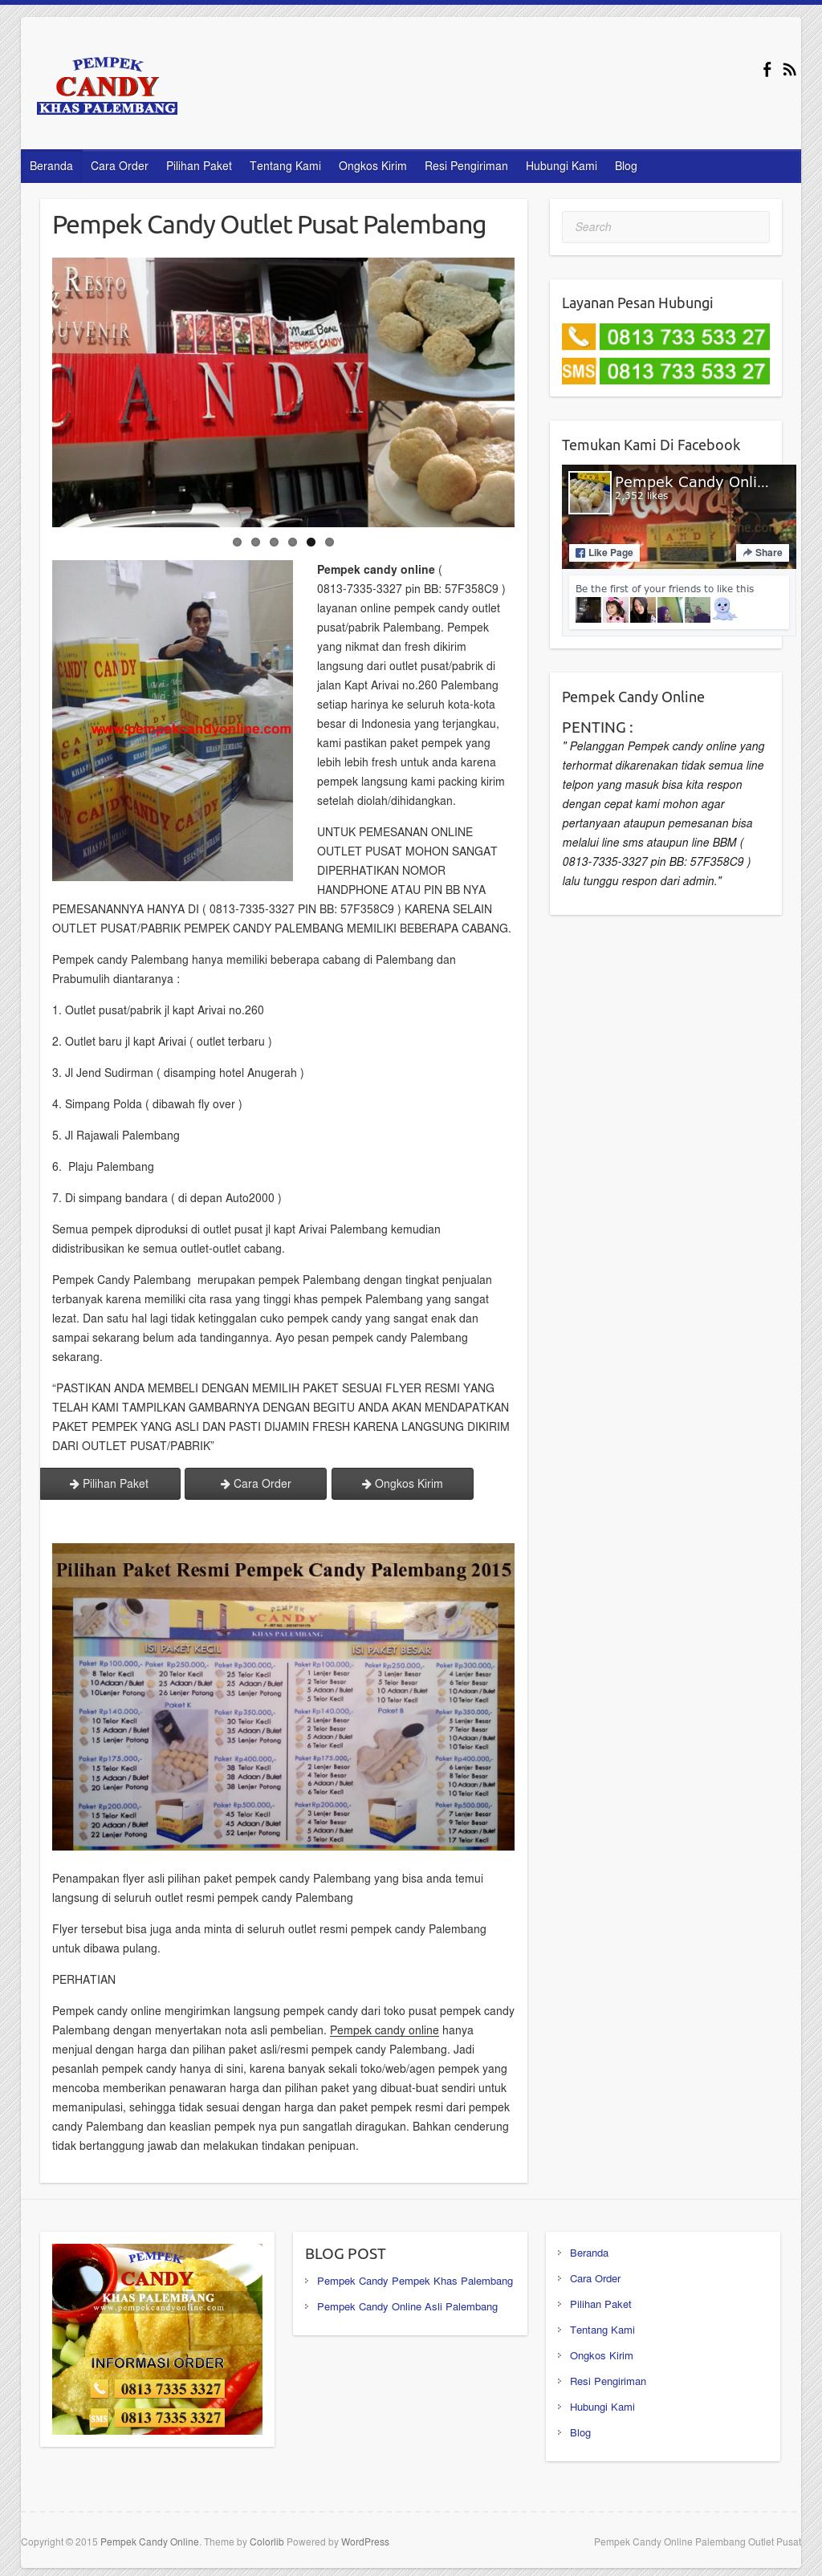 Harga Pempek Candy Update 2018 Dksh New Casual Baju Batik Stylish Pria Dkin 201 Online Competitors Revenue And Employees Owler Company Profile